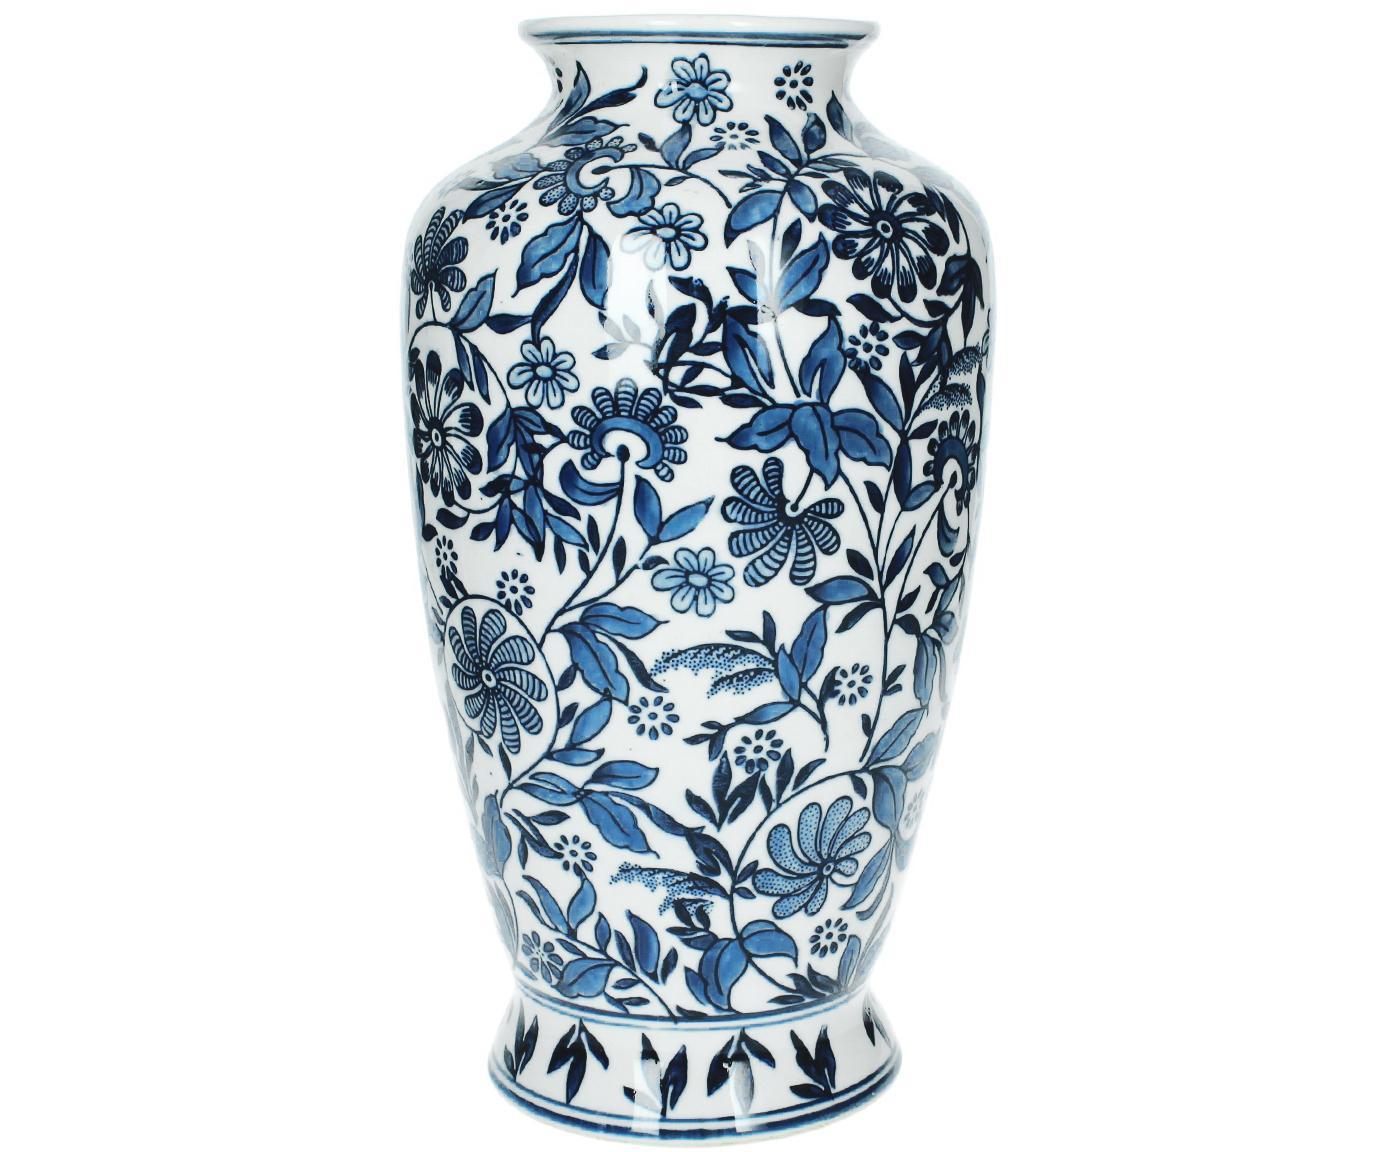 Jarrón de porcelana Lin, grande, Porcelana, no impermeable, Azul, blanco, Al 31 cm